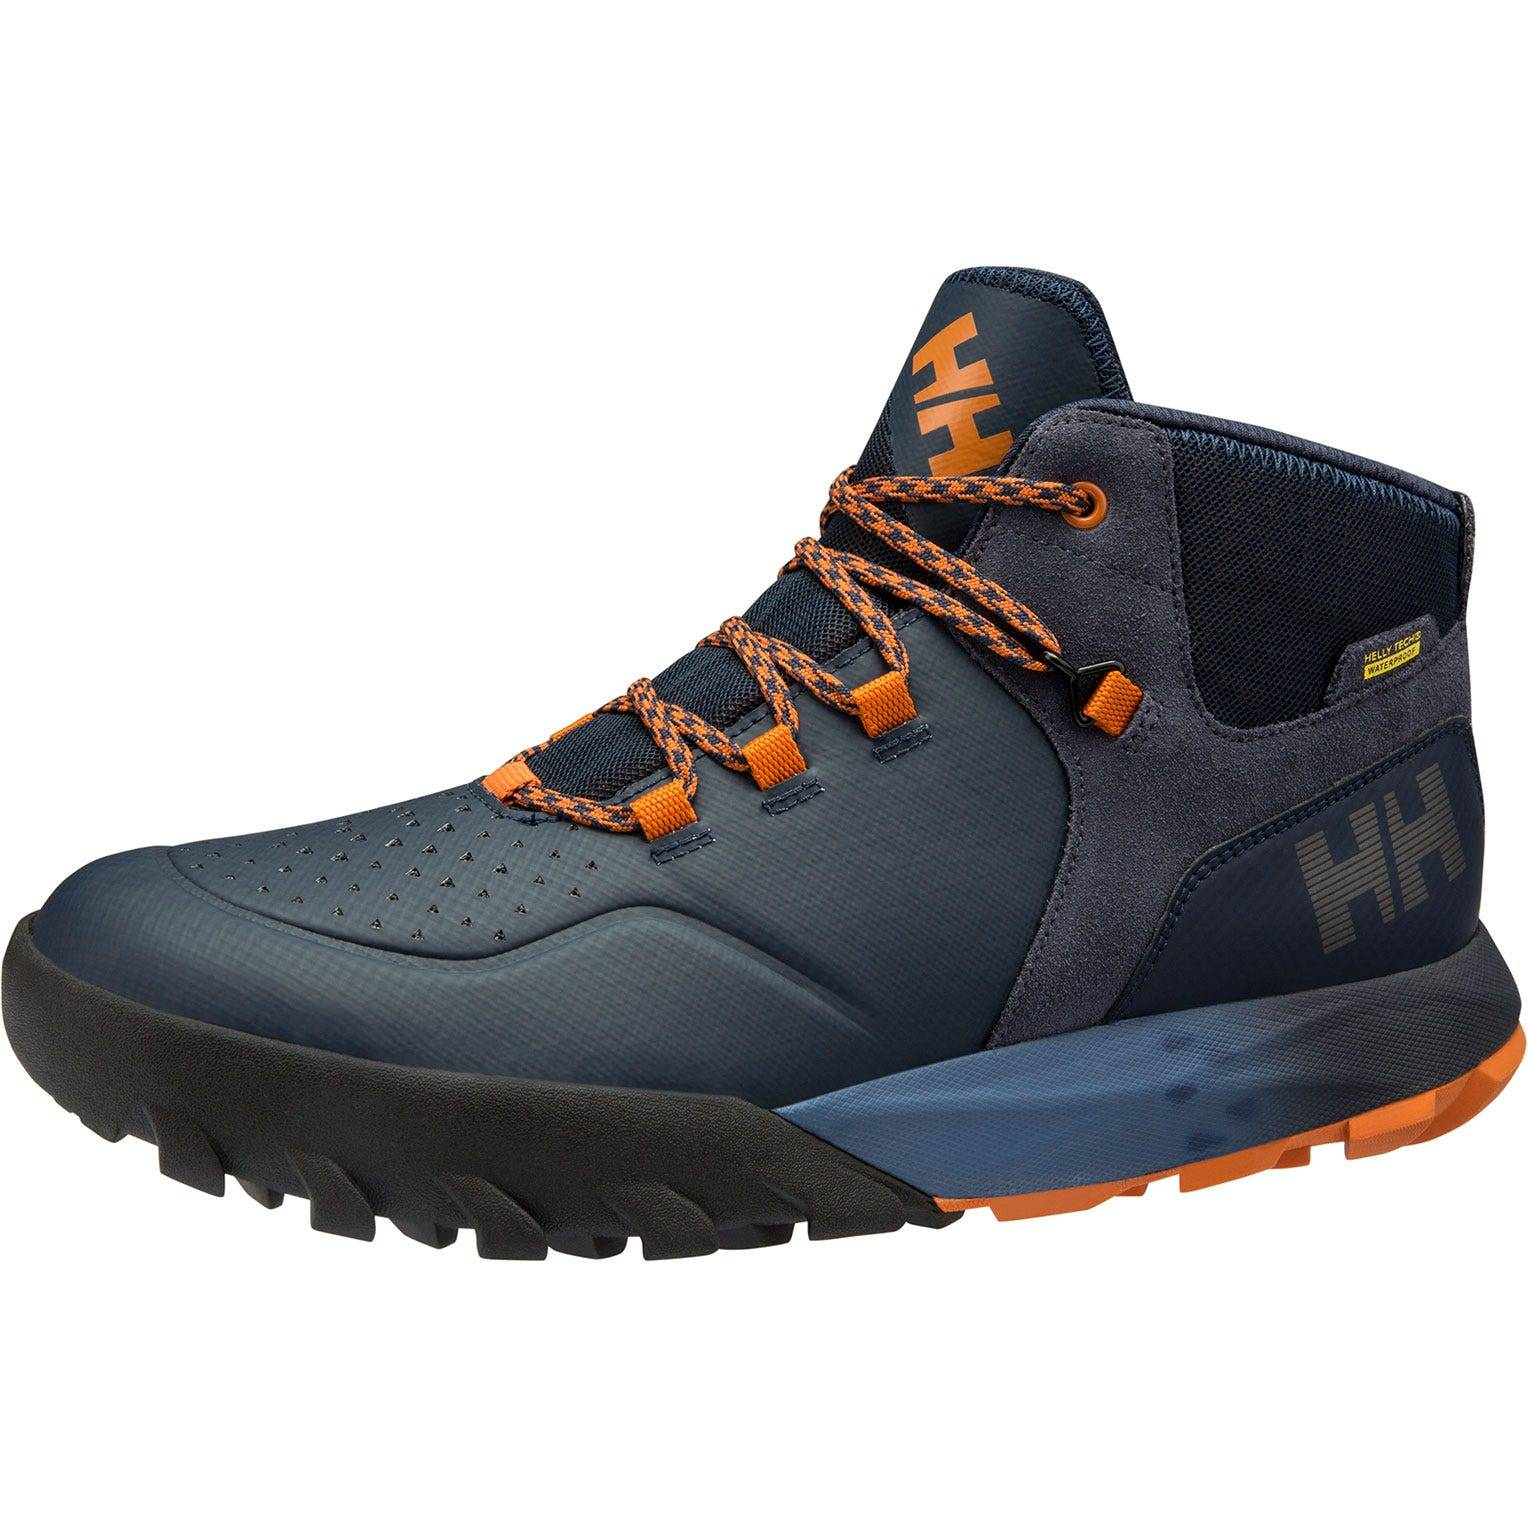 Helly Hansen Loke Rambler Ht Mens Hiking Boot Navy 41/8